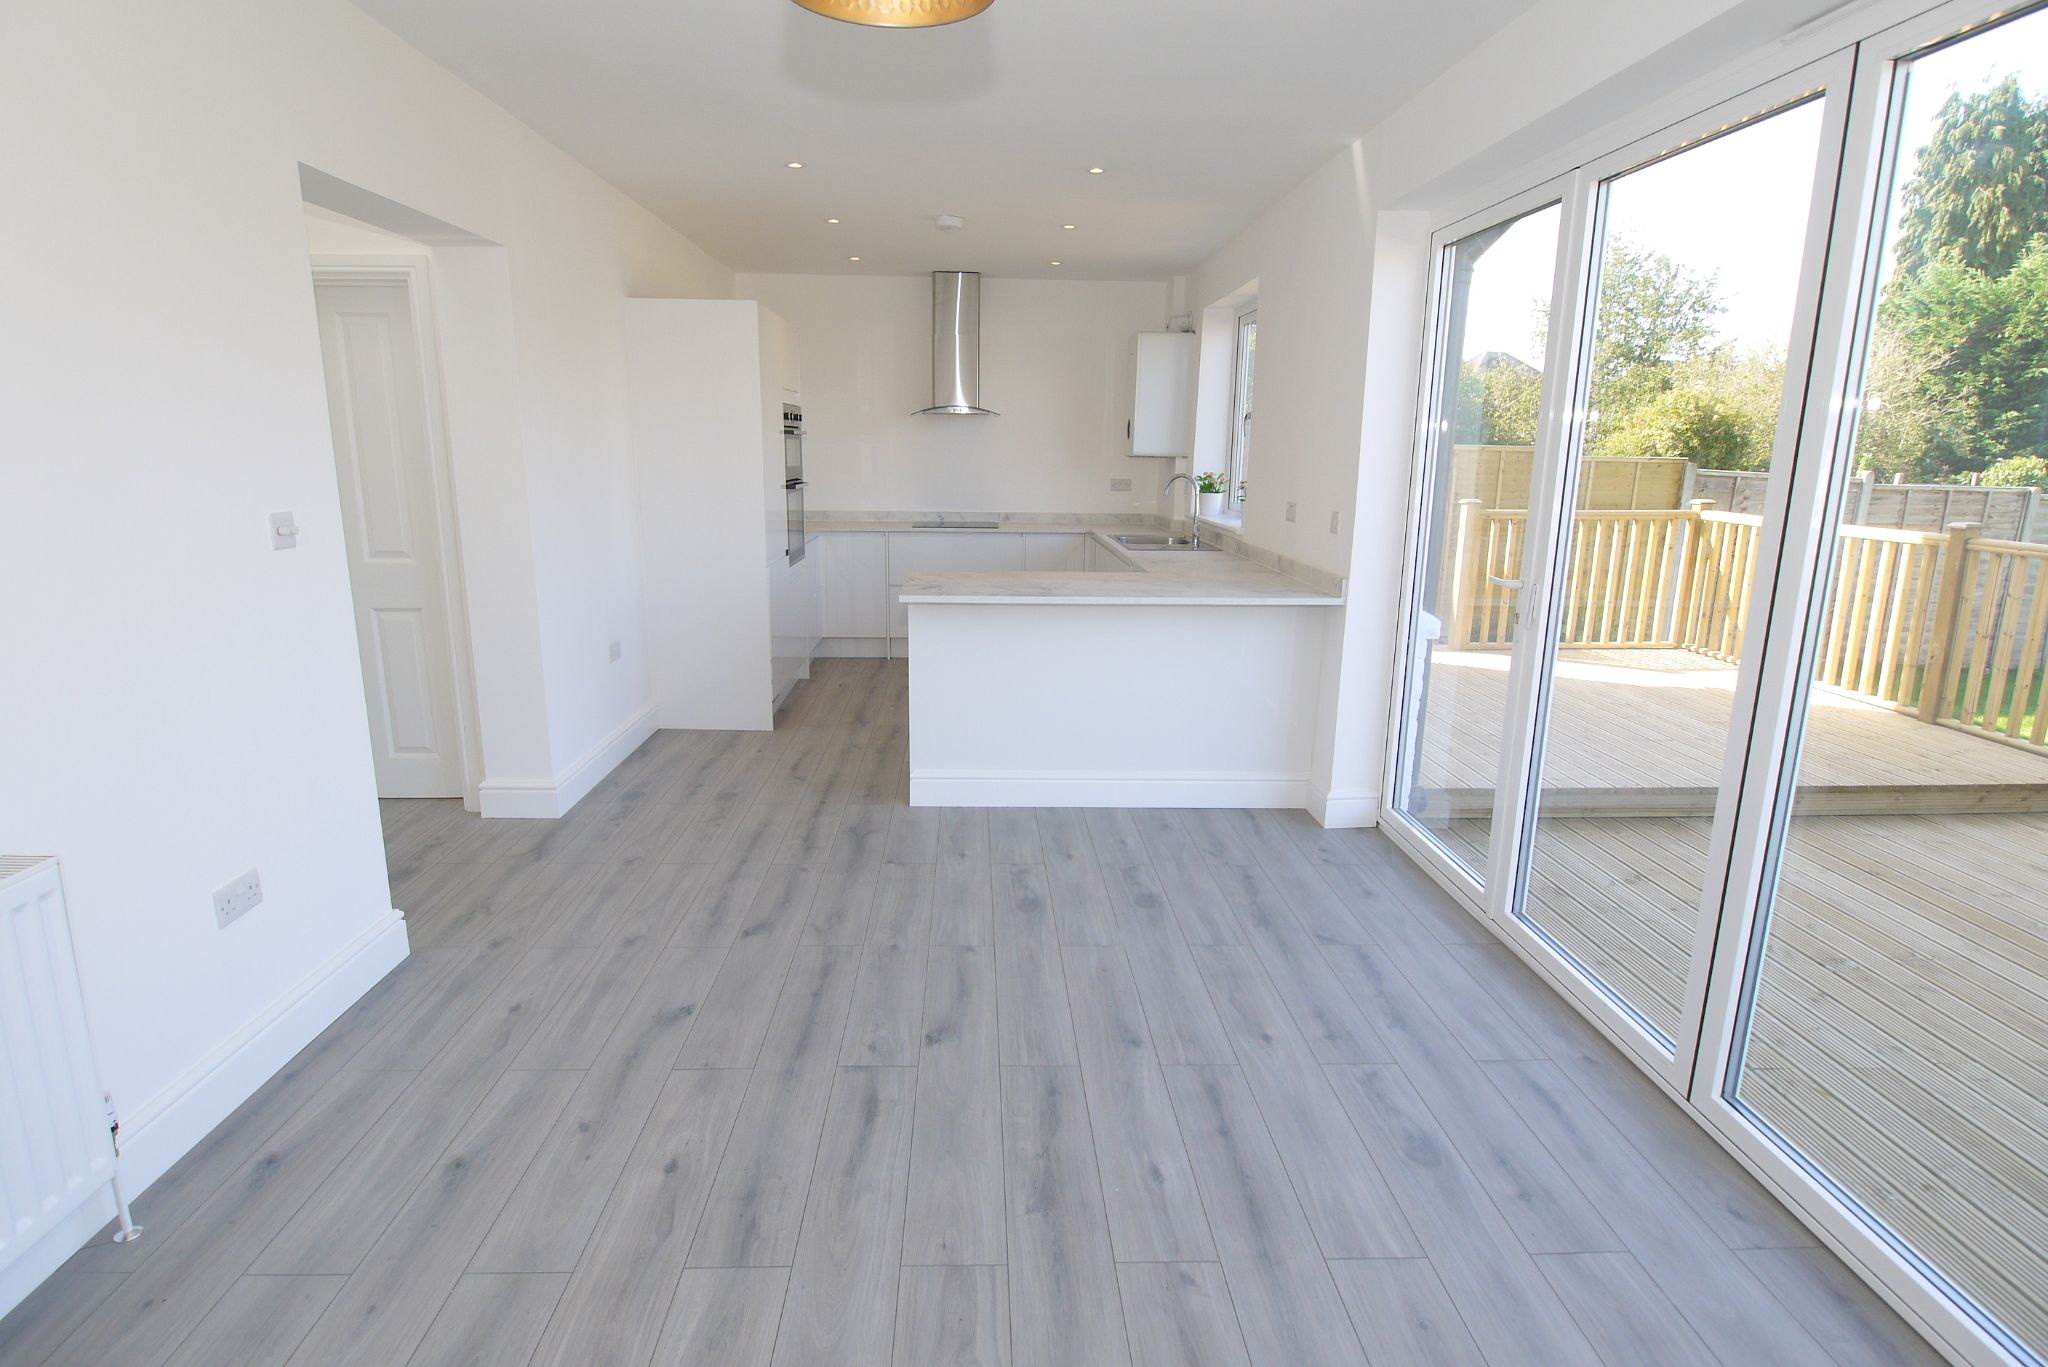 3 bedroom chalet house For Sale in Sevenoaks - Photograph 4